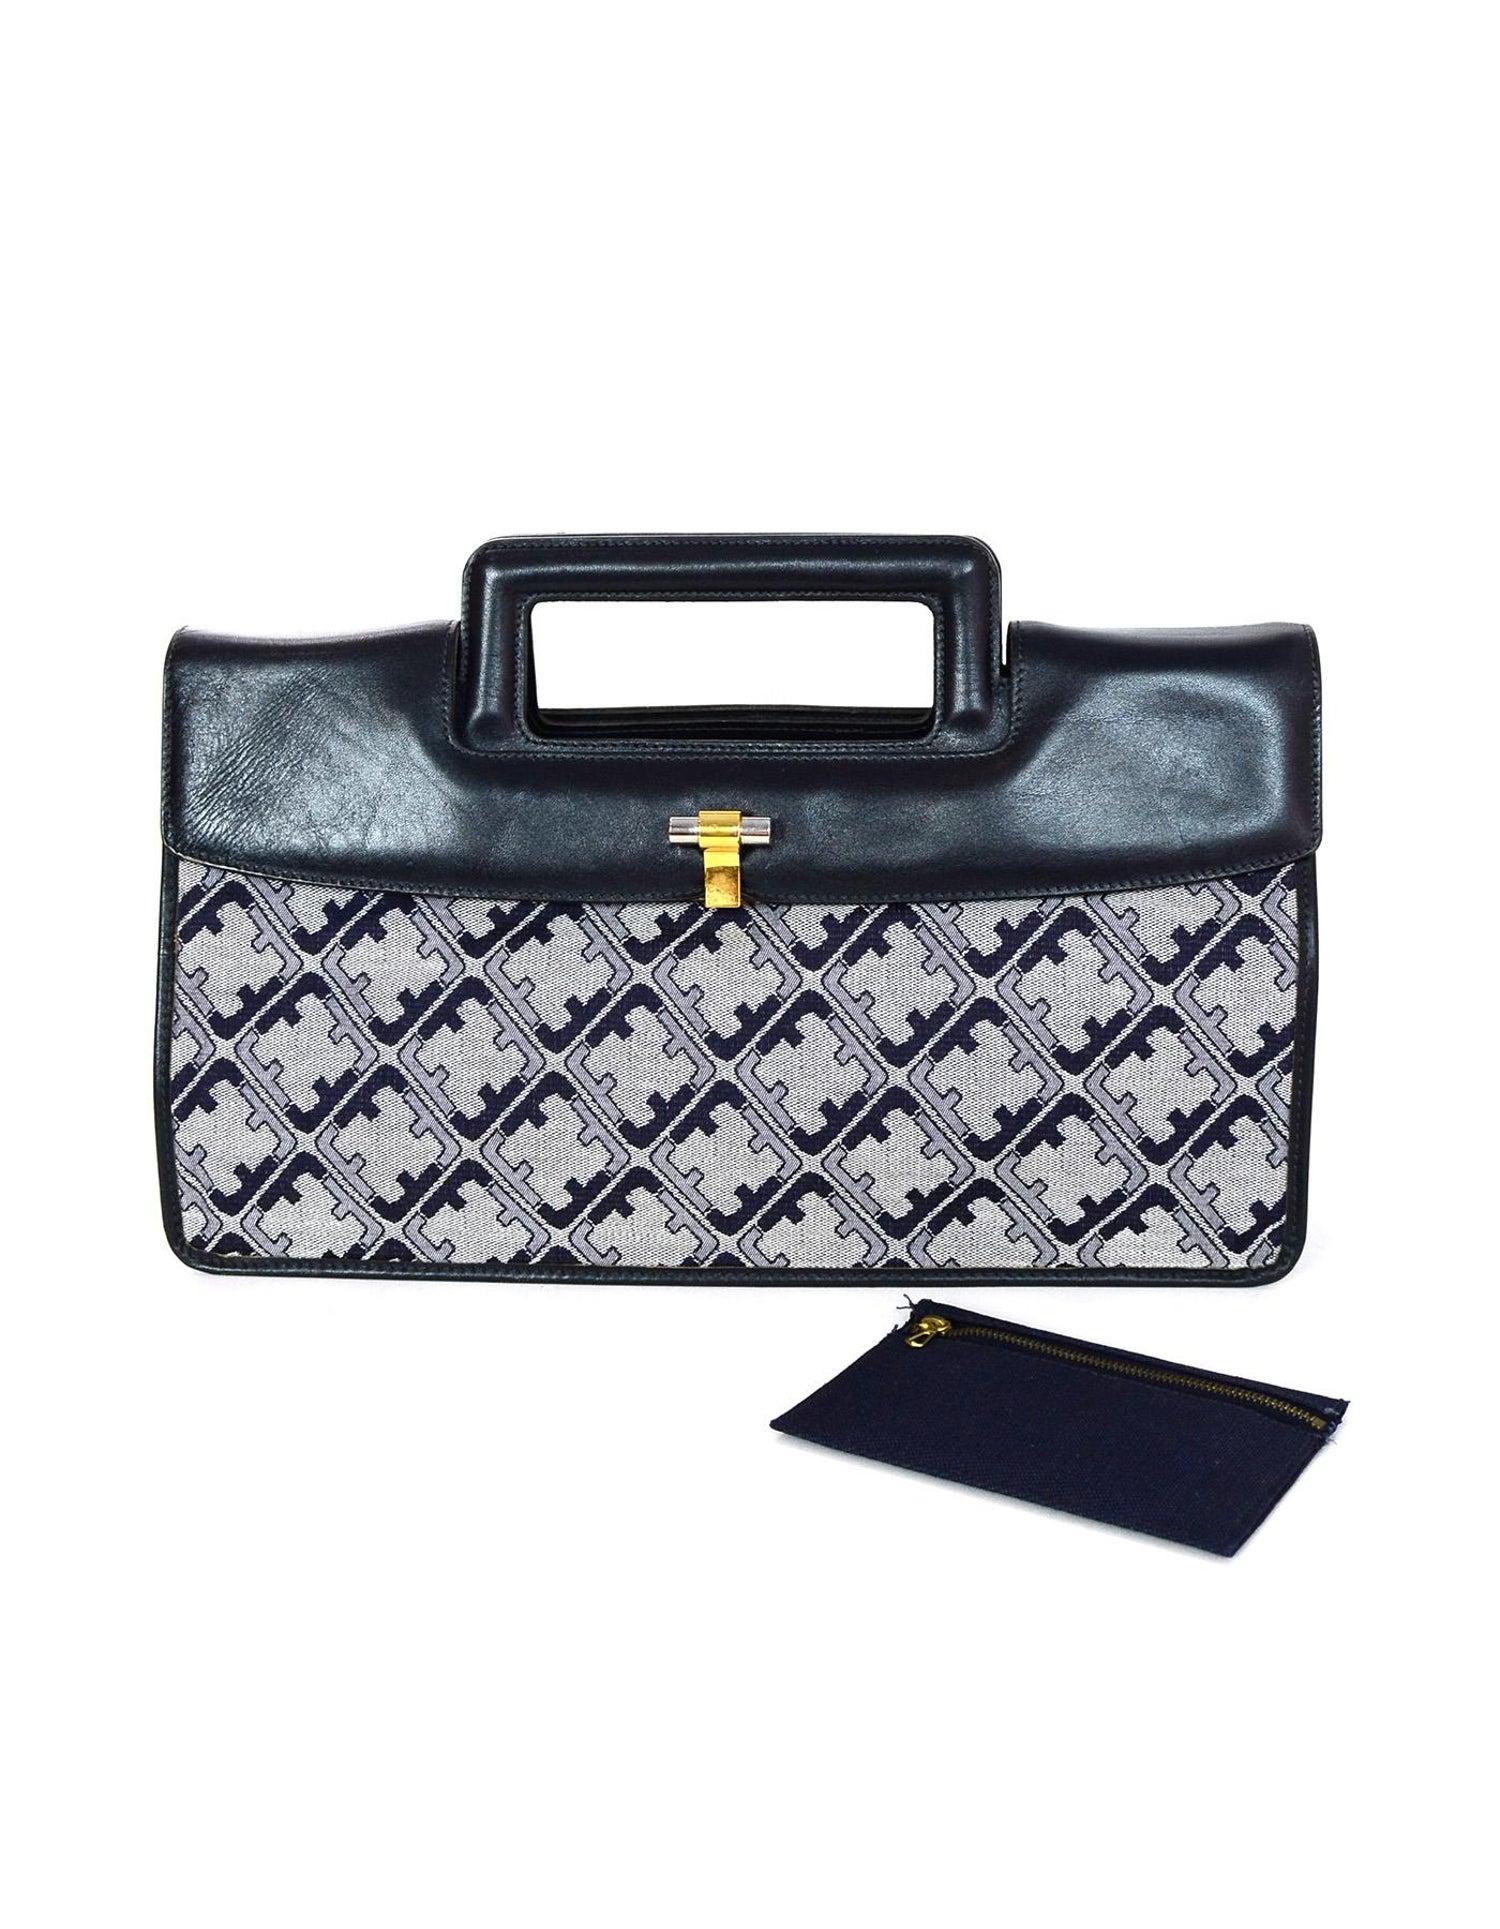 Salvatore Ferragamo Vintage Navy Grey Canvas Leather Monogram Top Handle Bag  For Sale at 1stdibs 3033b2c1ce